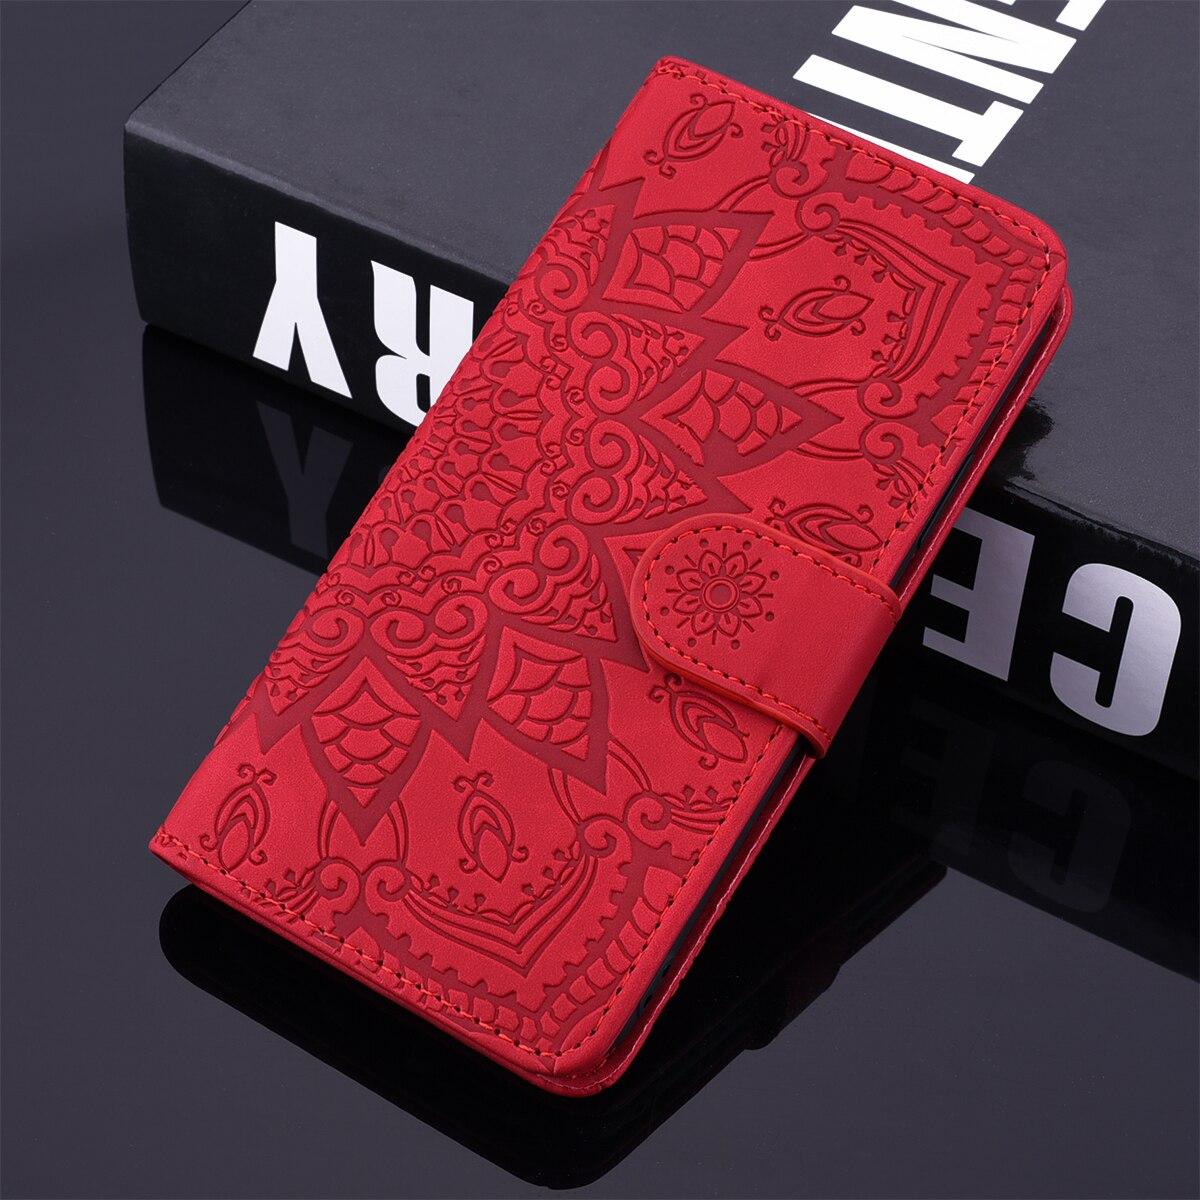 Для Xiaomi mi 9T Pro A3 A2 8 Lite 9 cc9 cc9e PocoPhone F1 кожаный чехол-книжка с цветком для Xiao mi 9 mi 9T mi 8 mi A2 Lite F1